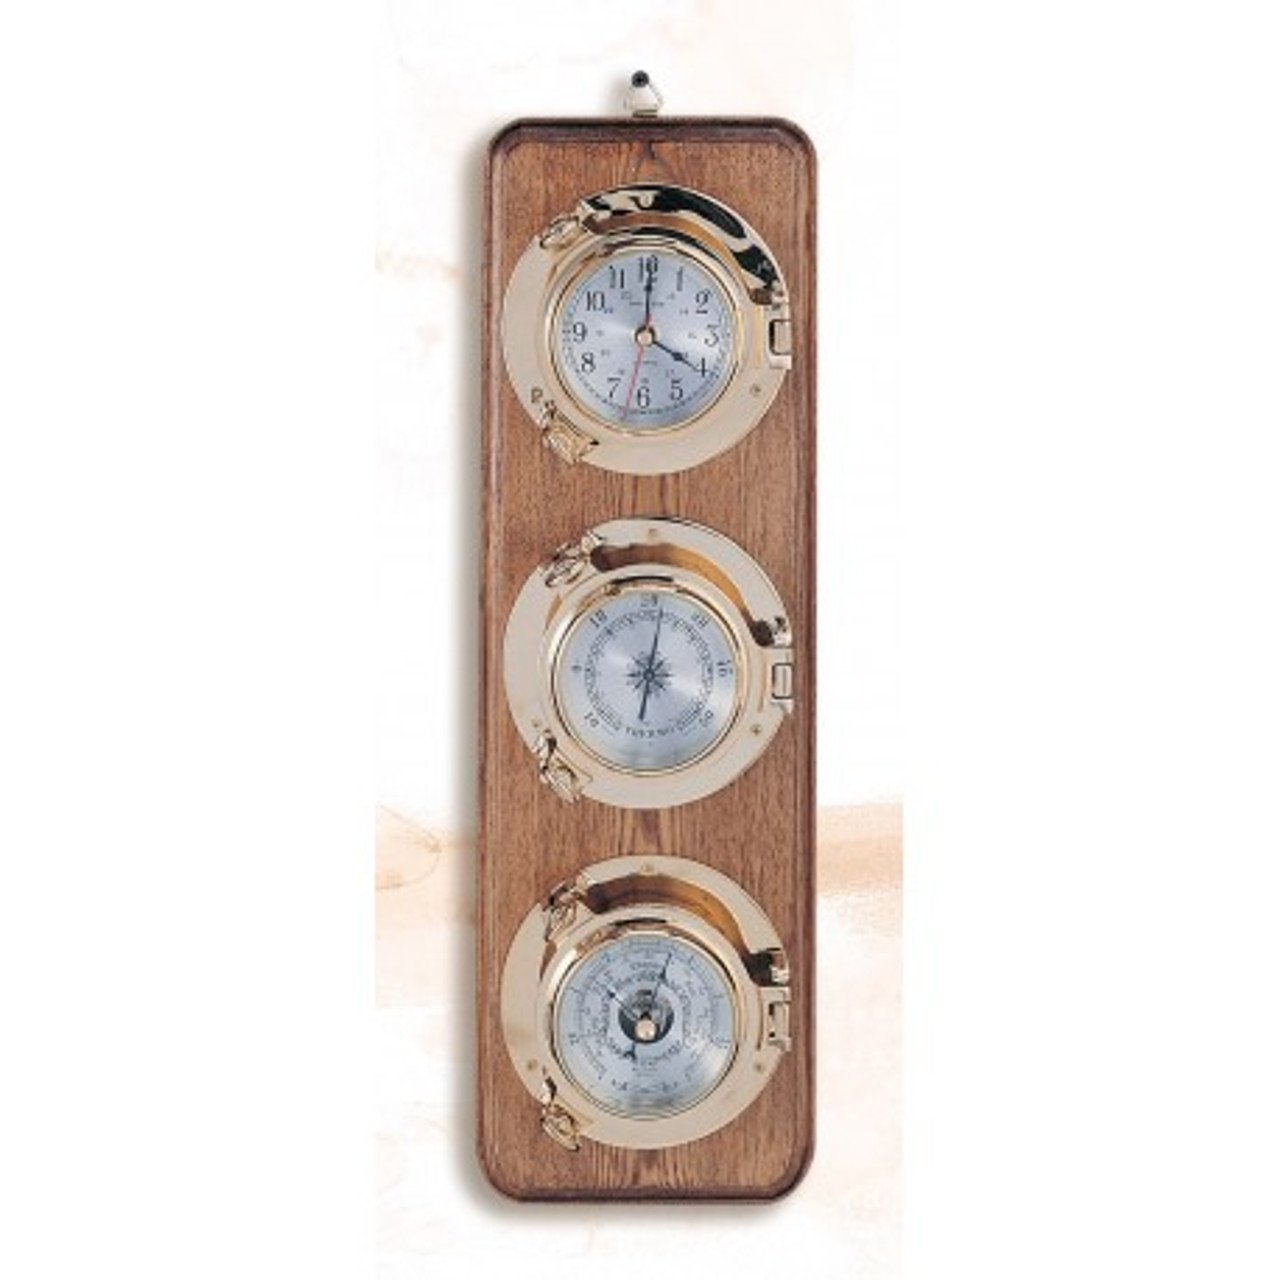 "(262-3)  21"" Premium Porthole Clock, Barometer, and Thermometer on Wooden Base"